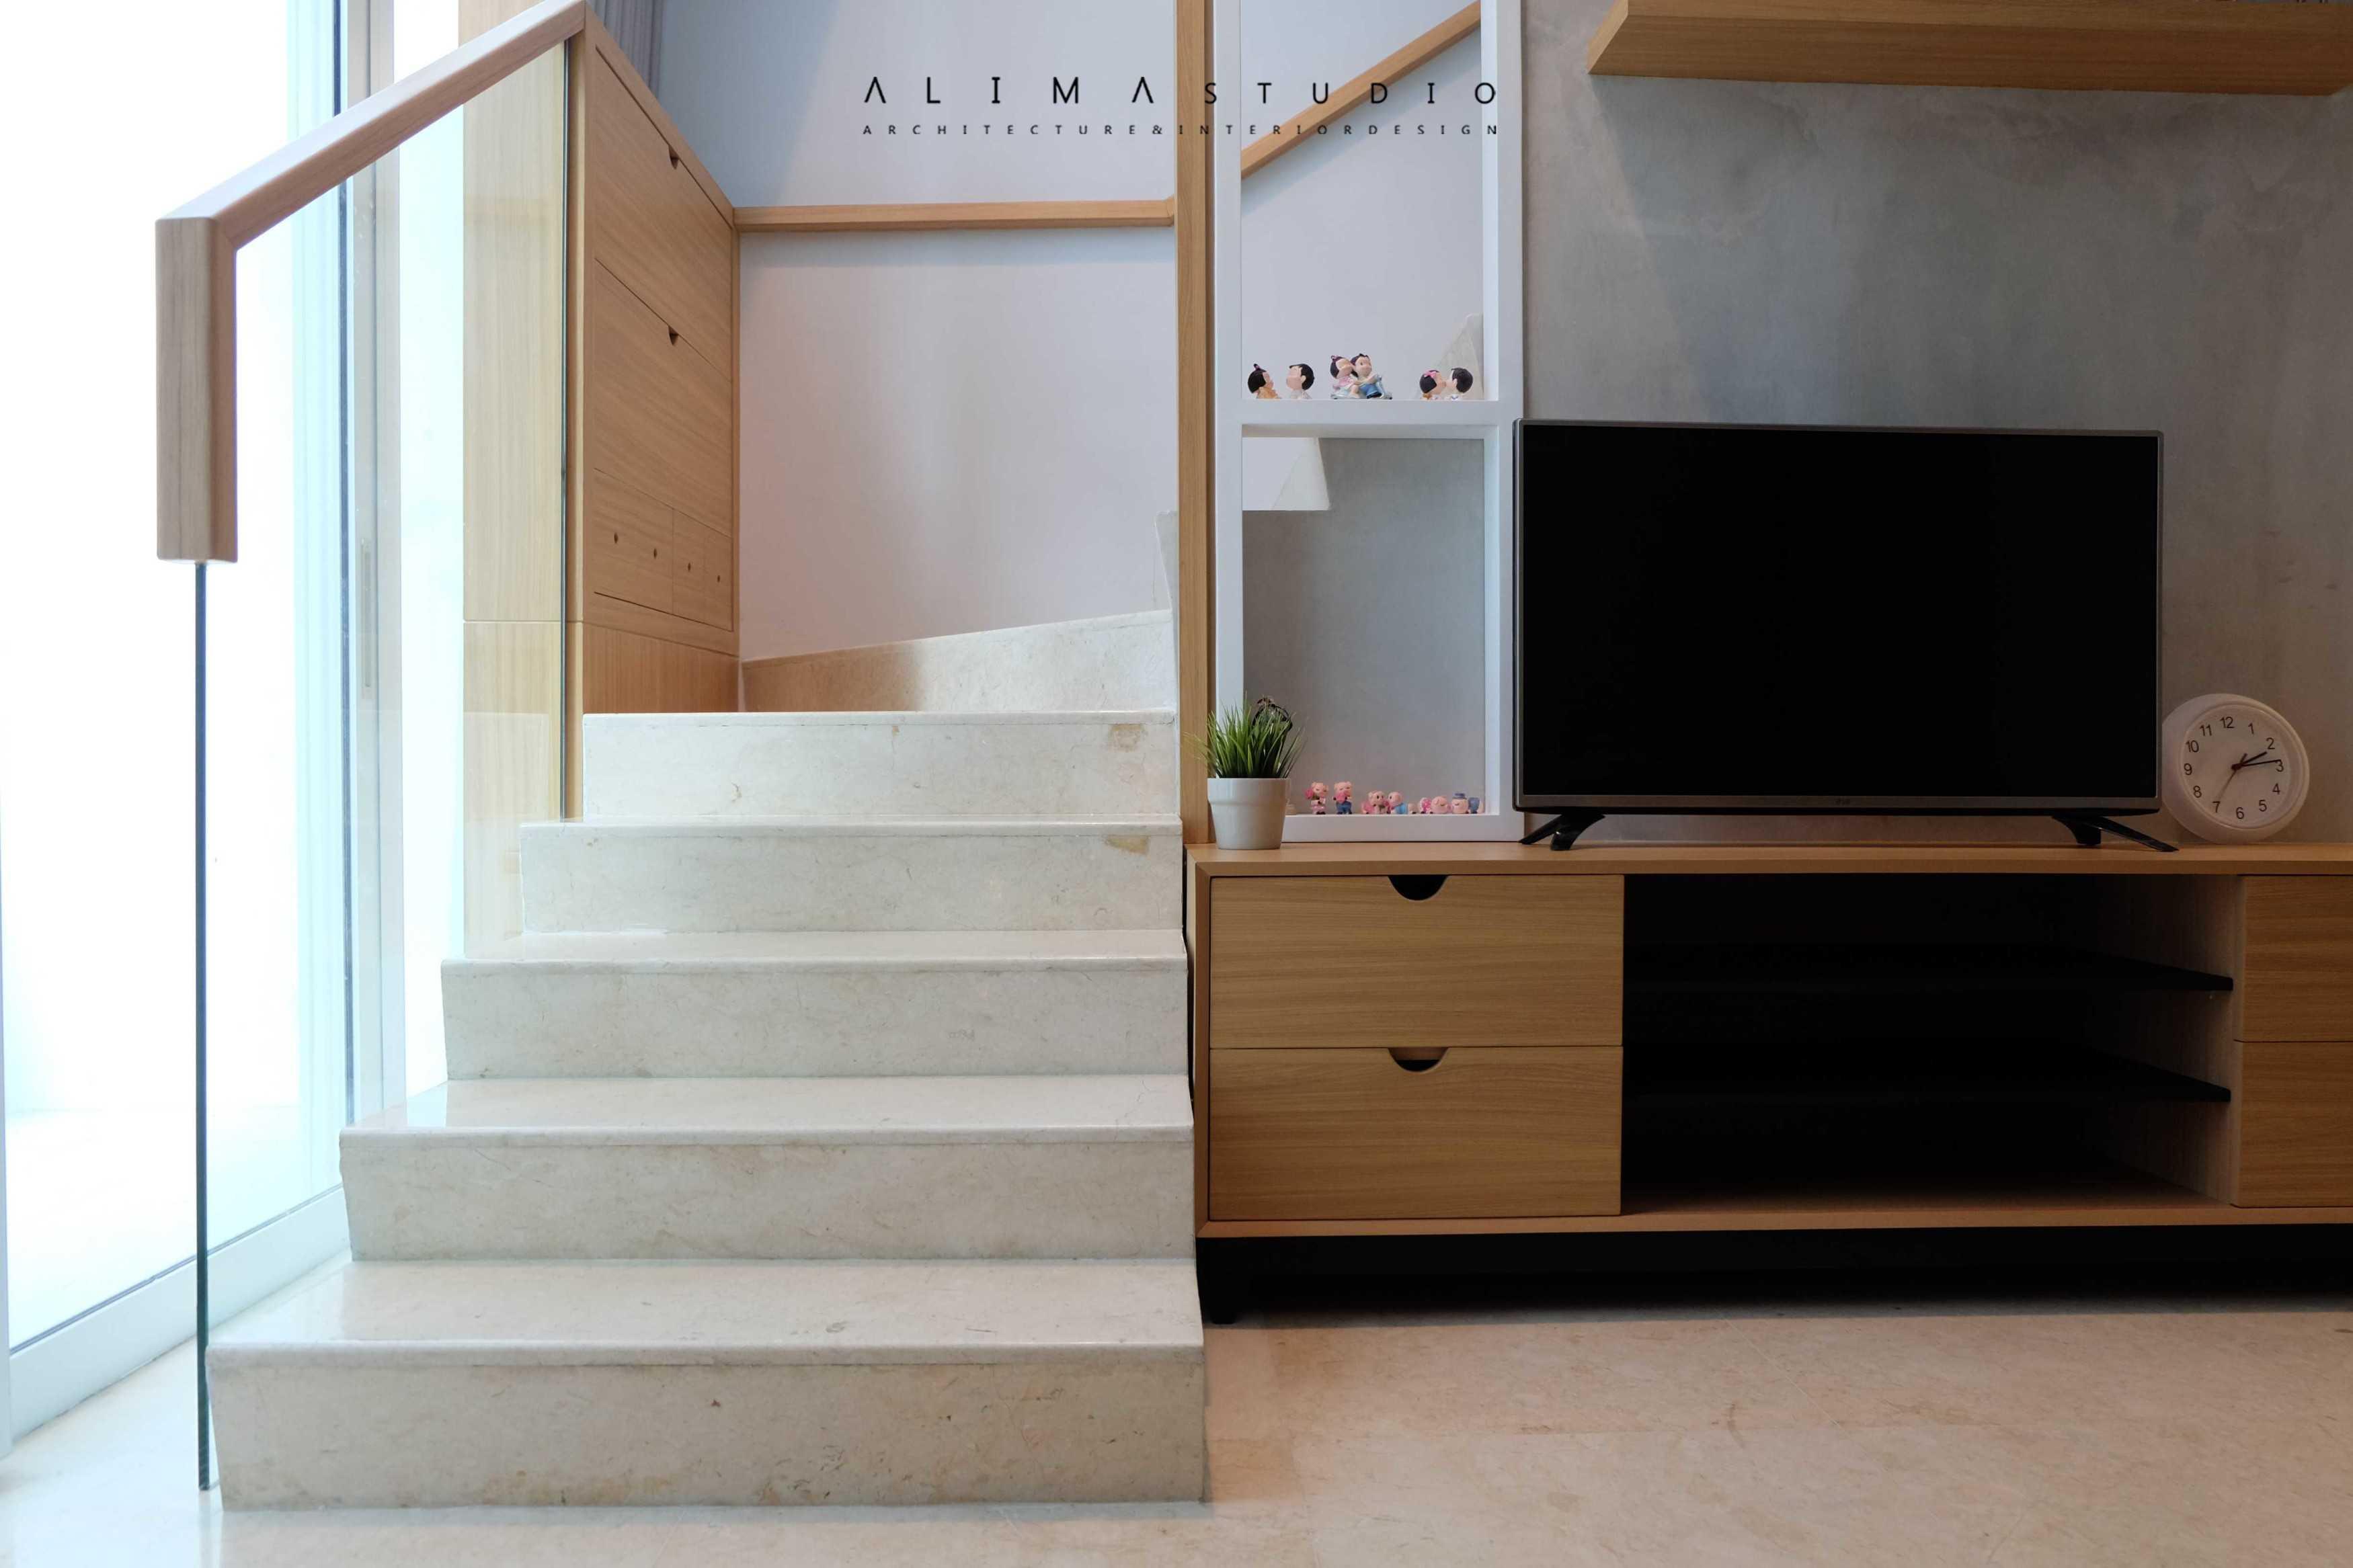 Alima Studio Apartment Satu8 Kedoya Selatan, Jakarta, Indonesia Kedoya Selatan, Jakarta, Indonesia Dscf8080-W Skandinavia  30635